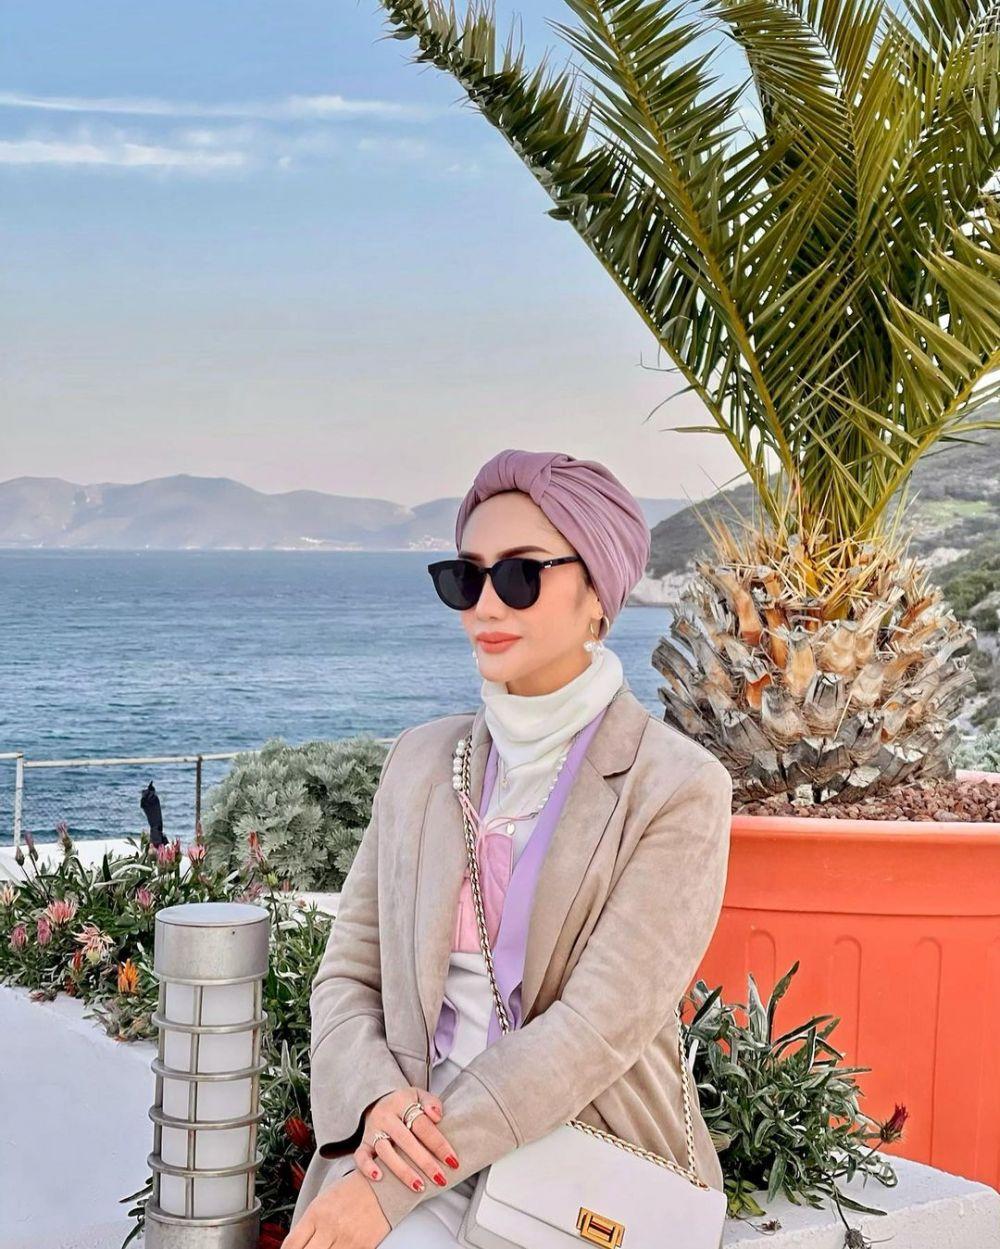 Yulita MasterChef liburan ke Turki © Instagram